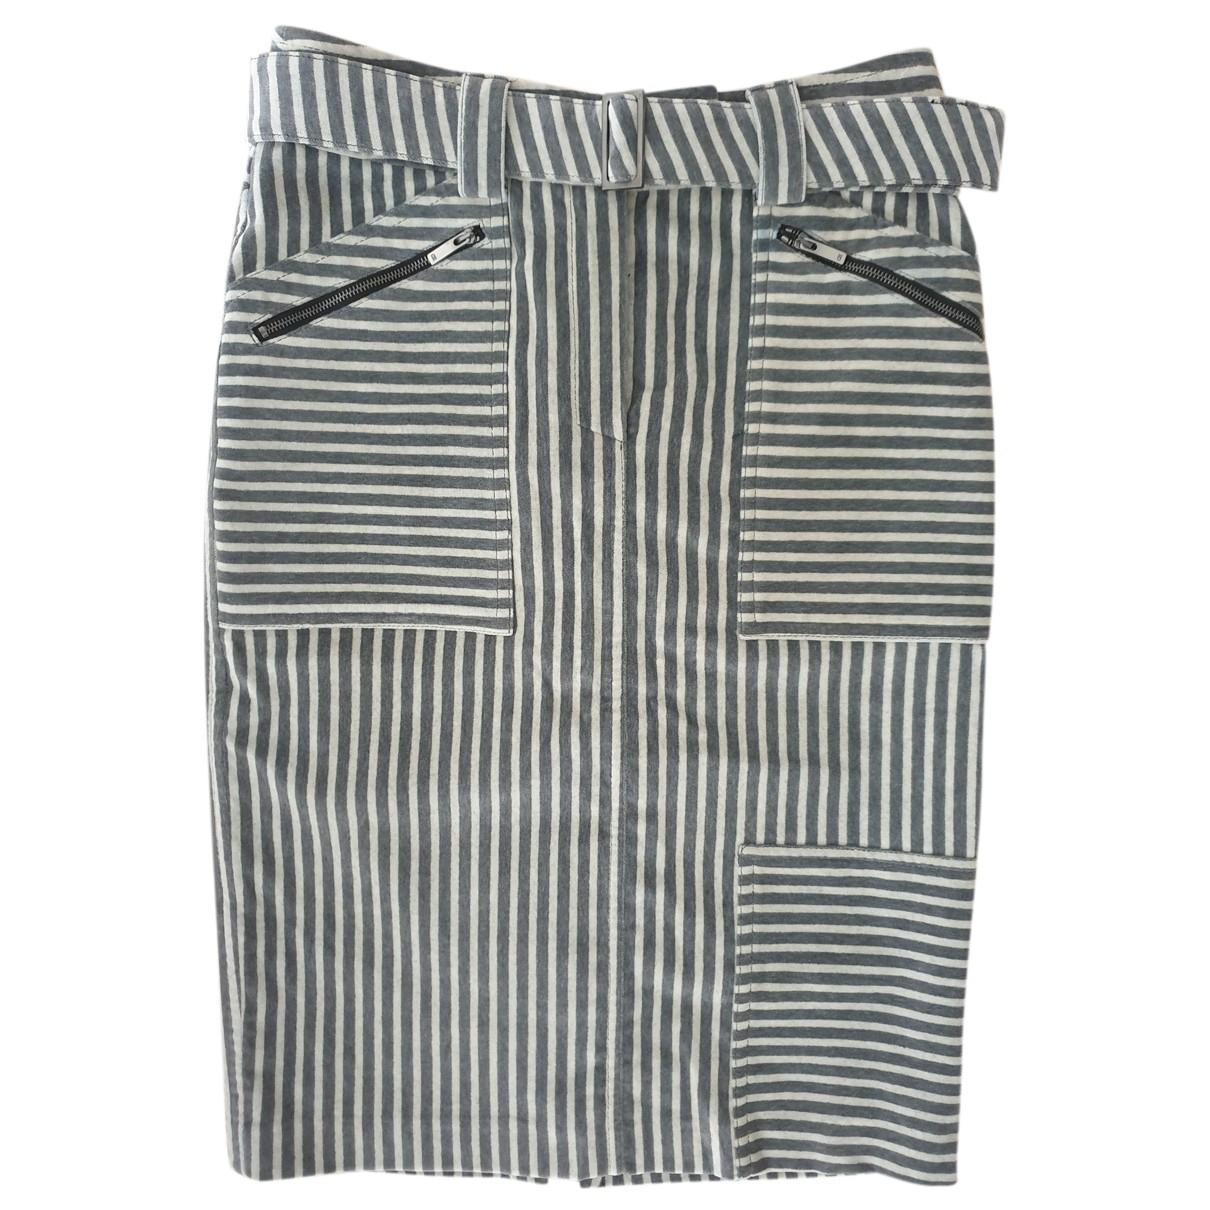 Carolina Herrera - Jupe   pour femme en coton - gris